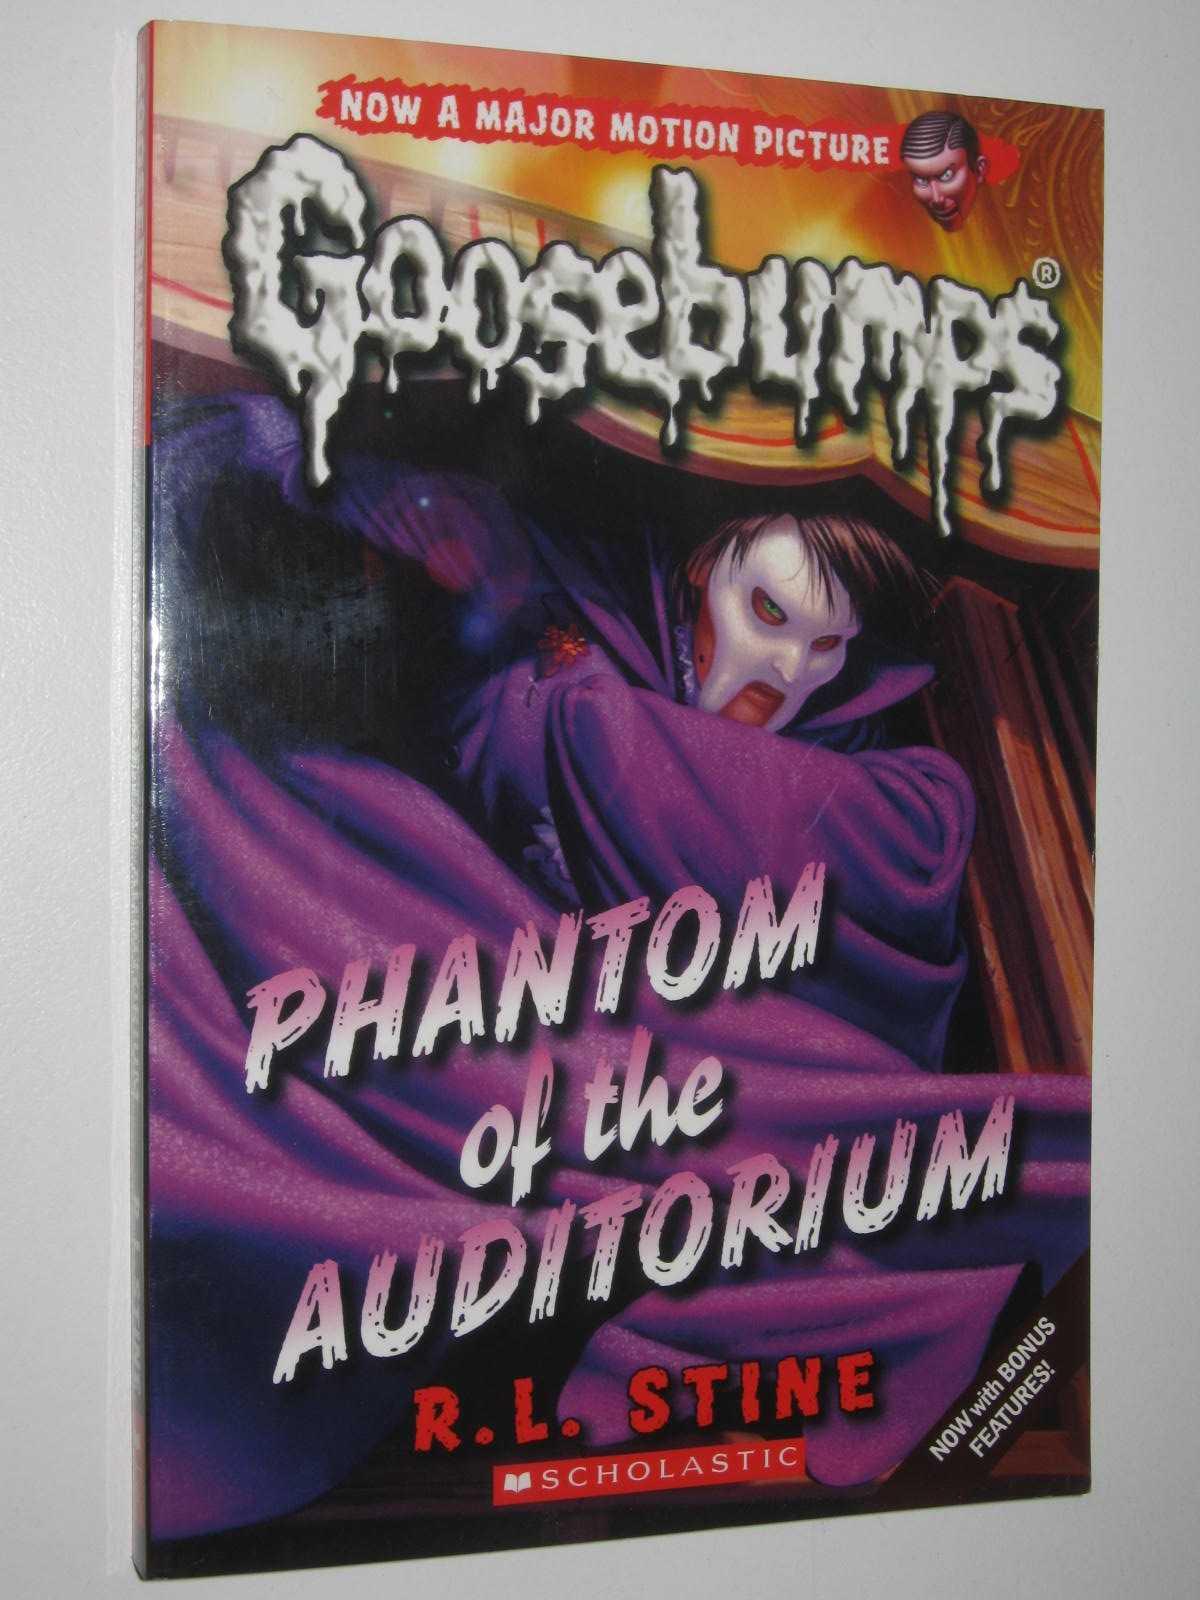 Image for Phantom of the Auditorium - Goosebumps Series #24